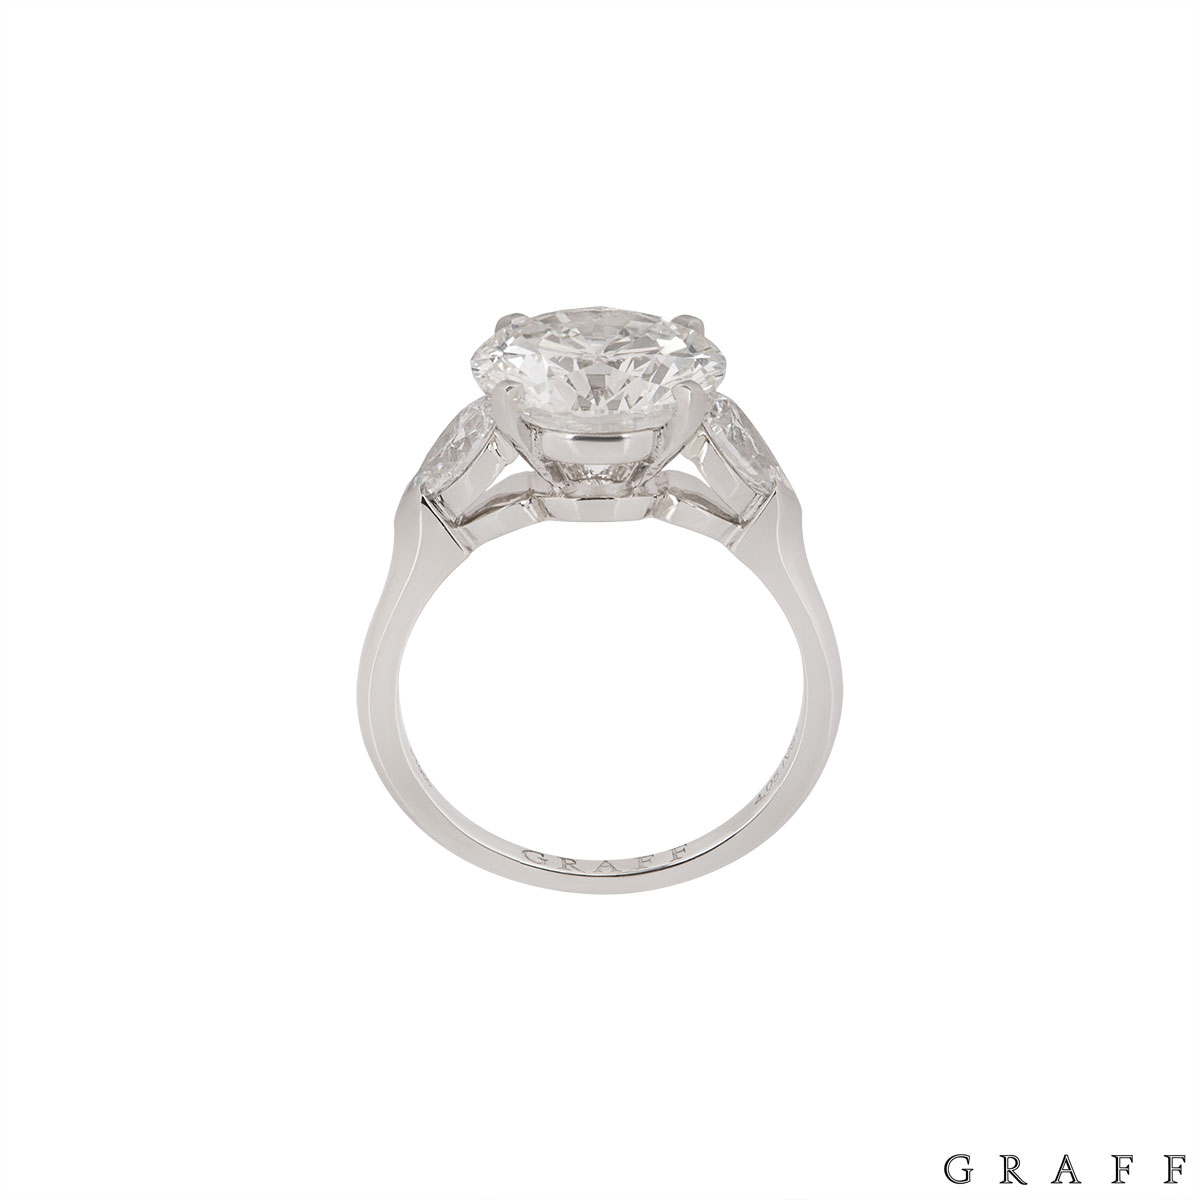 Graff Platinum Diamond Promise Ring 4.04ct I/VVS2